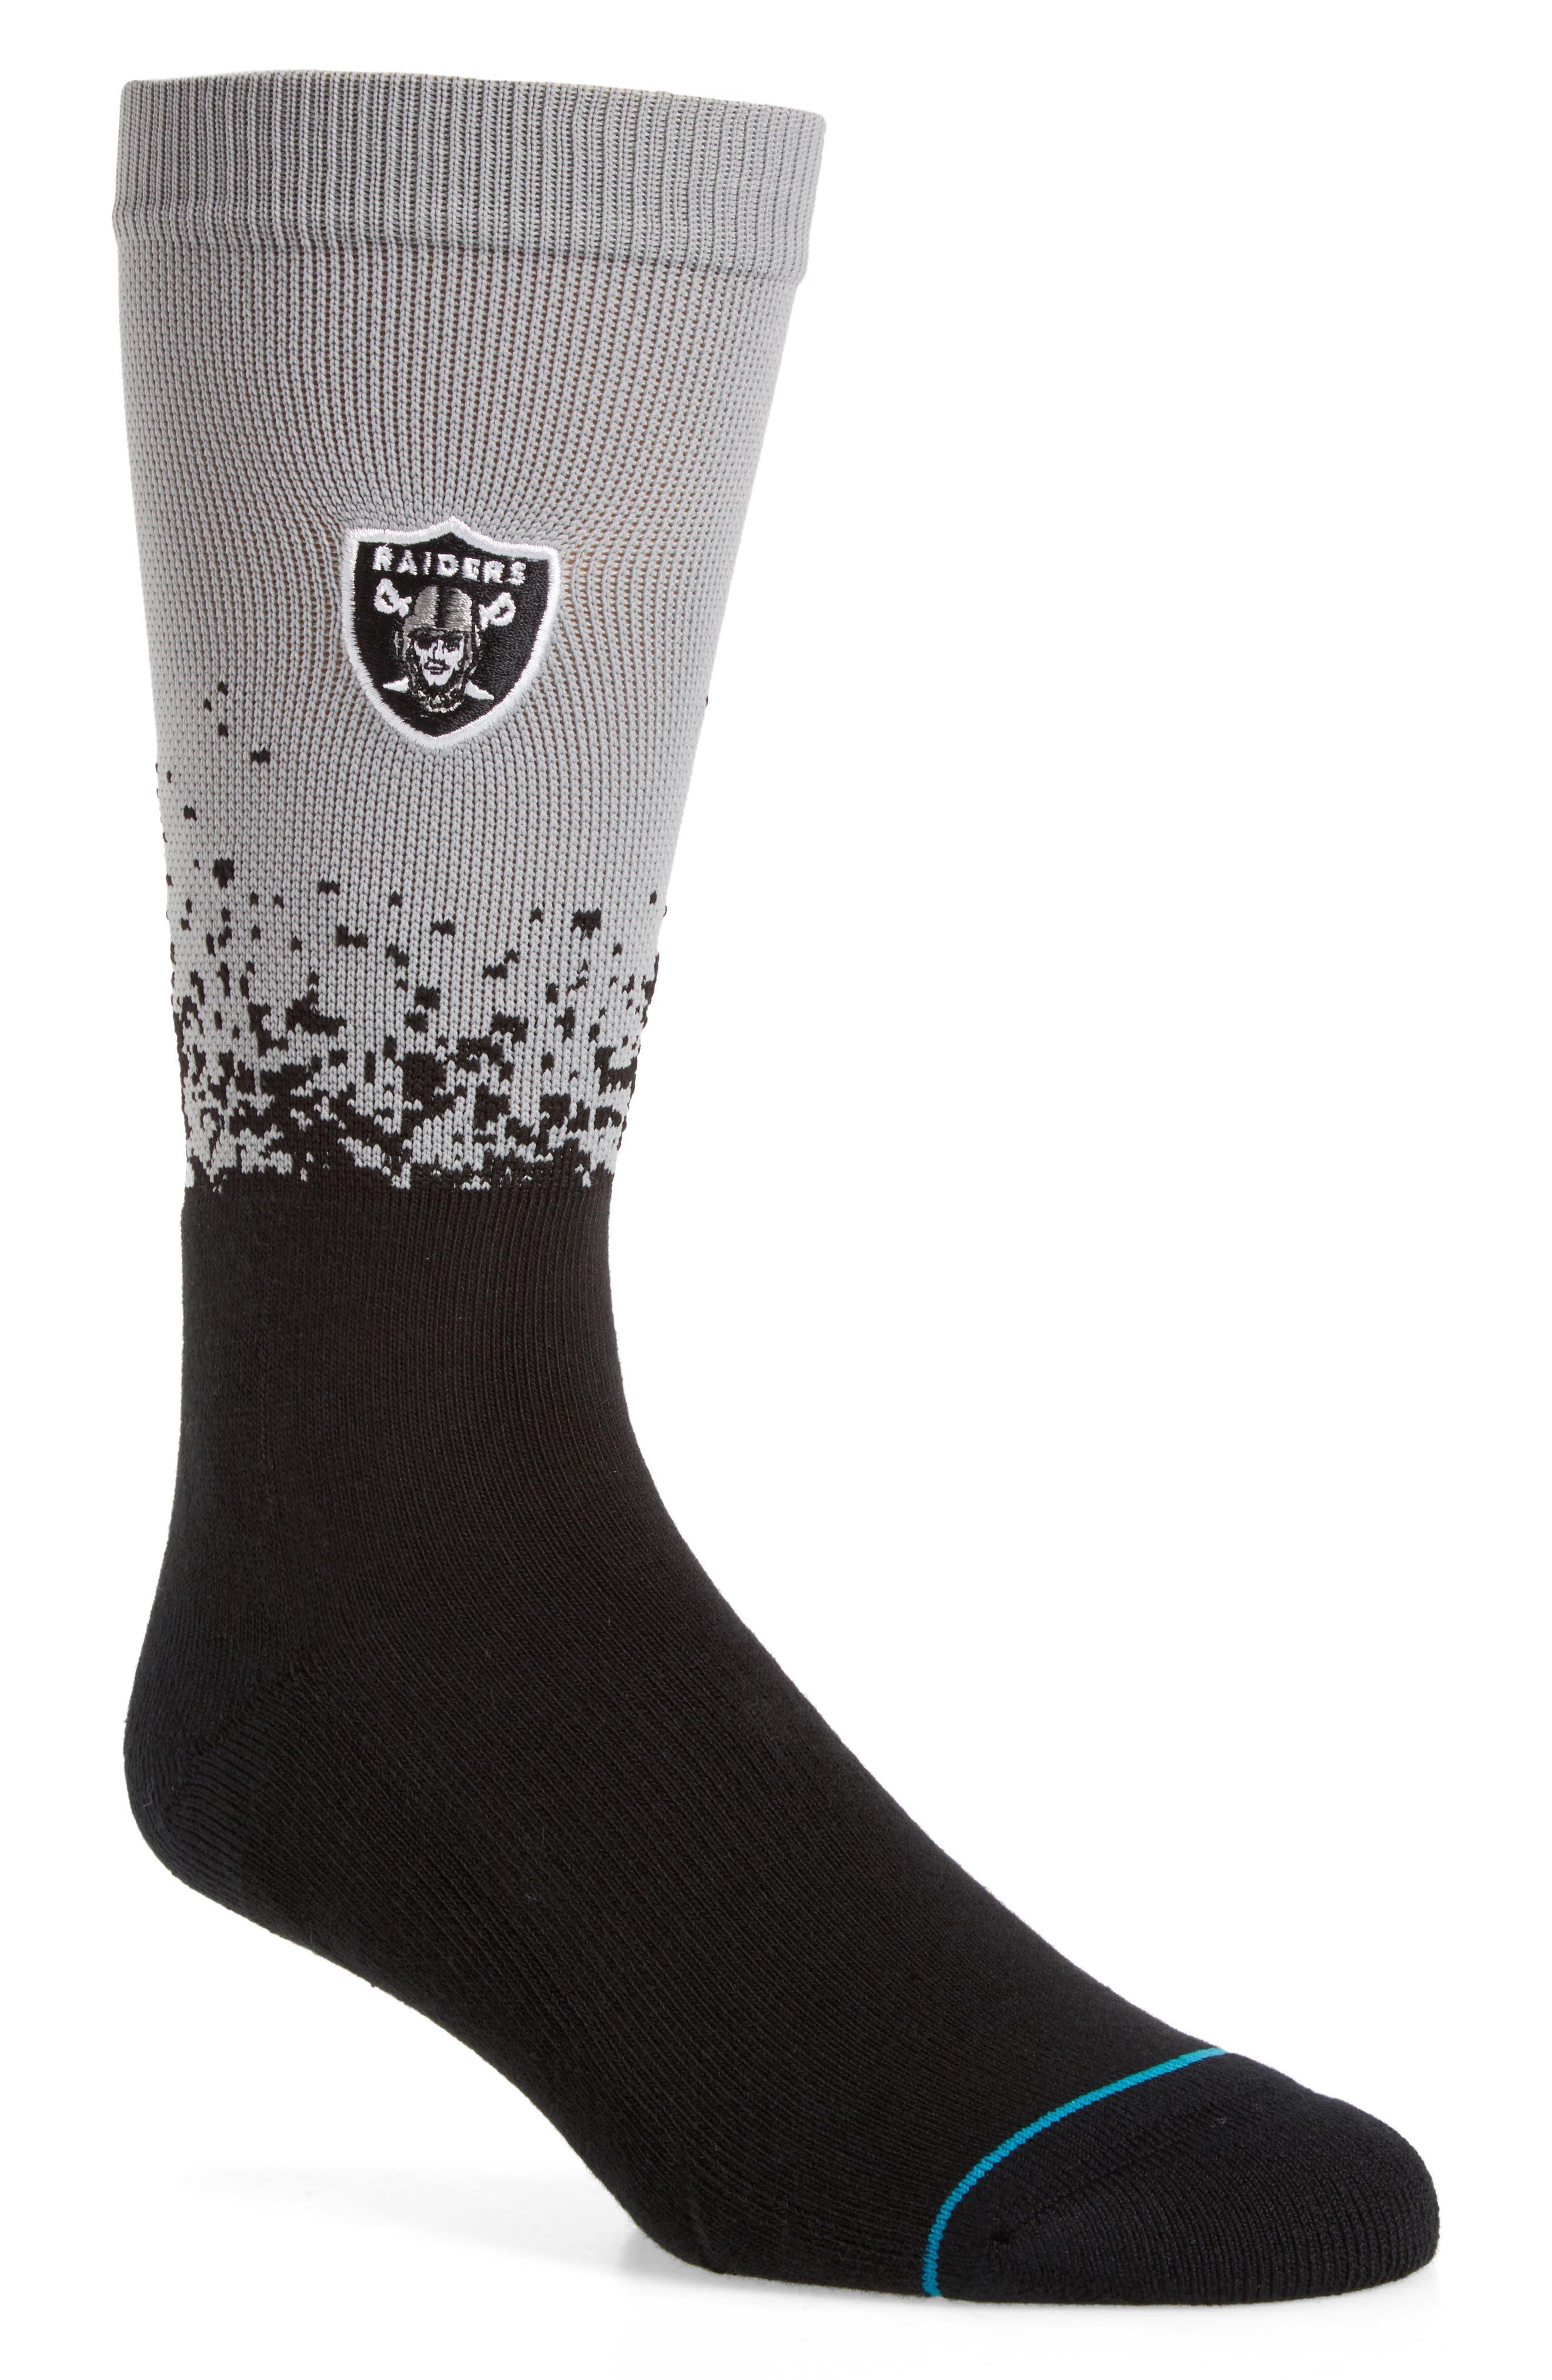 Oakland Raiders - Fade Socks,                             Main thumbnail 1, color,                             Black